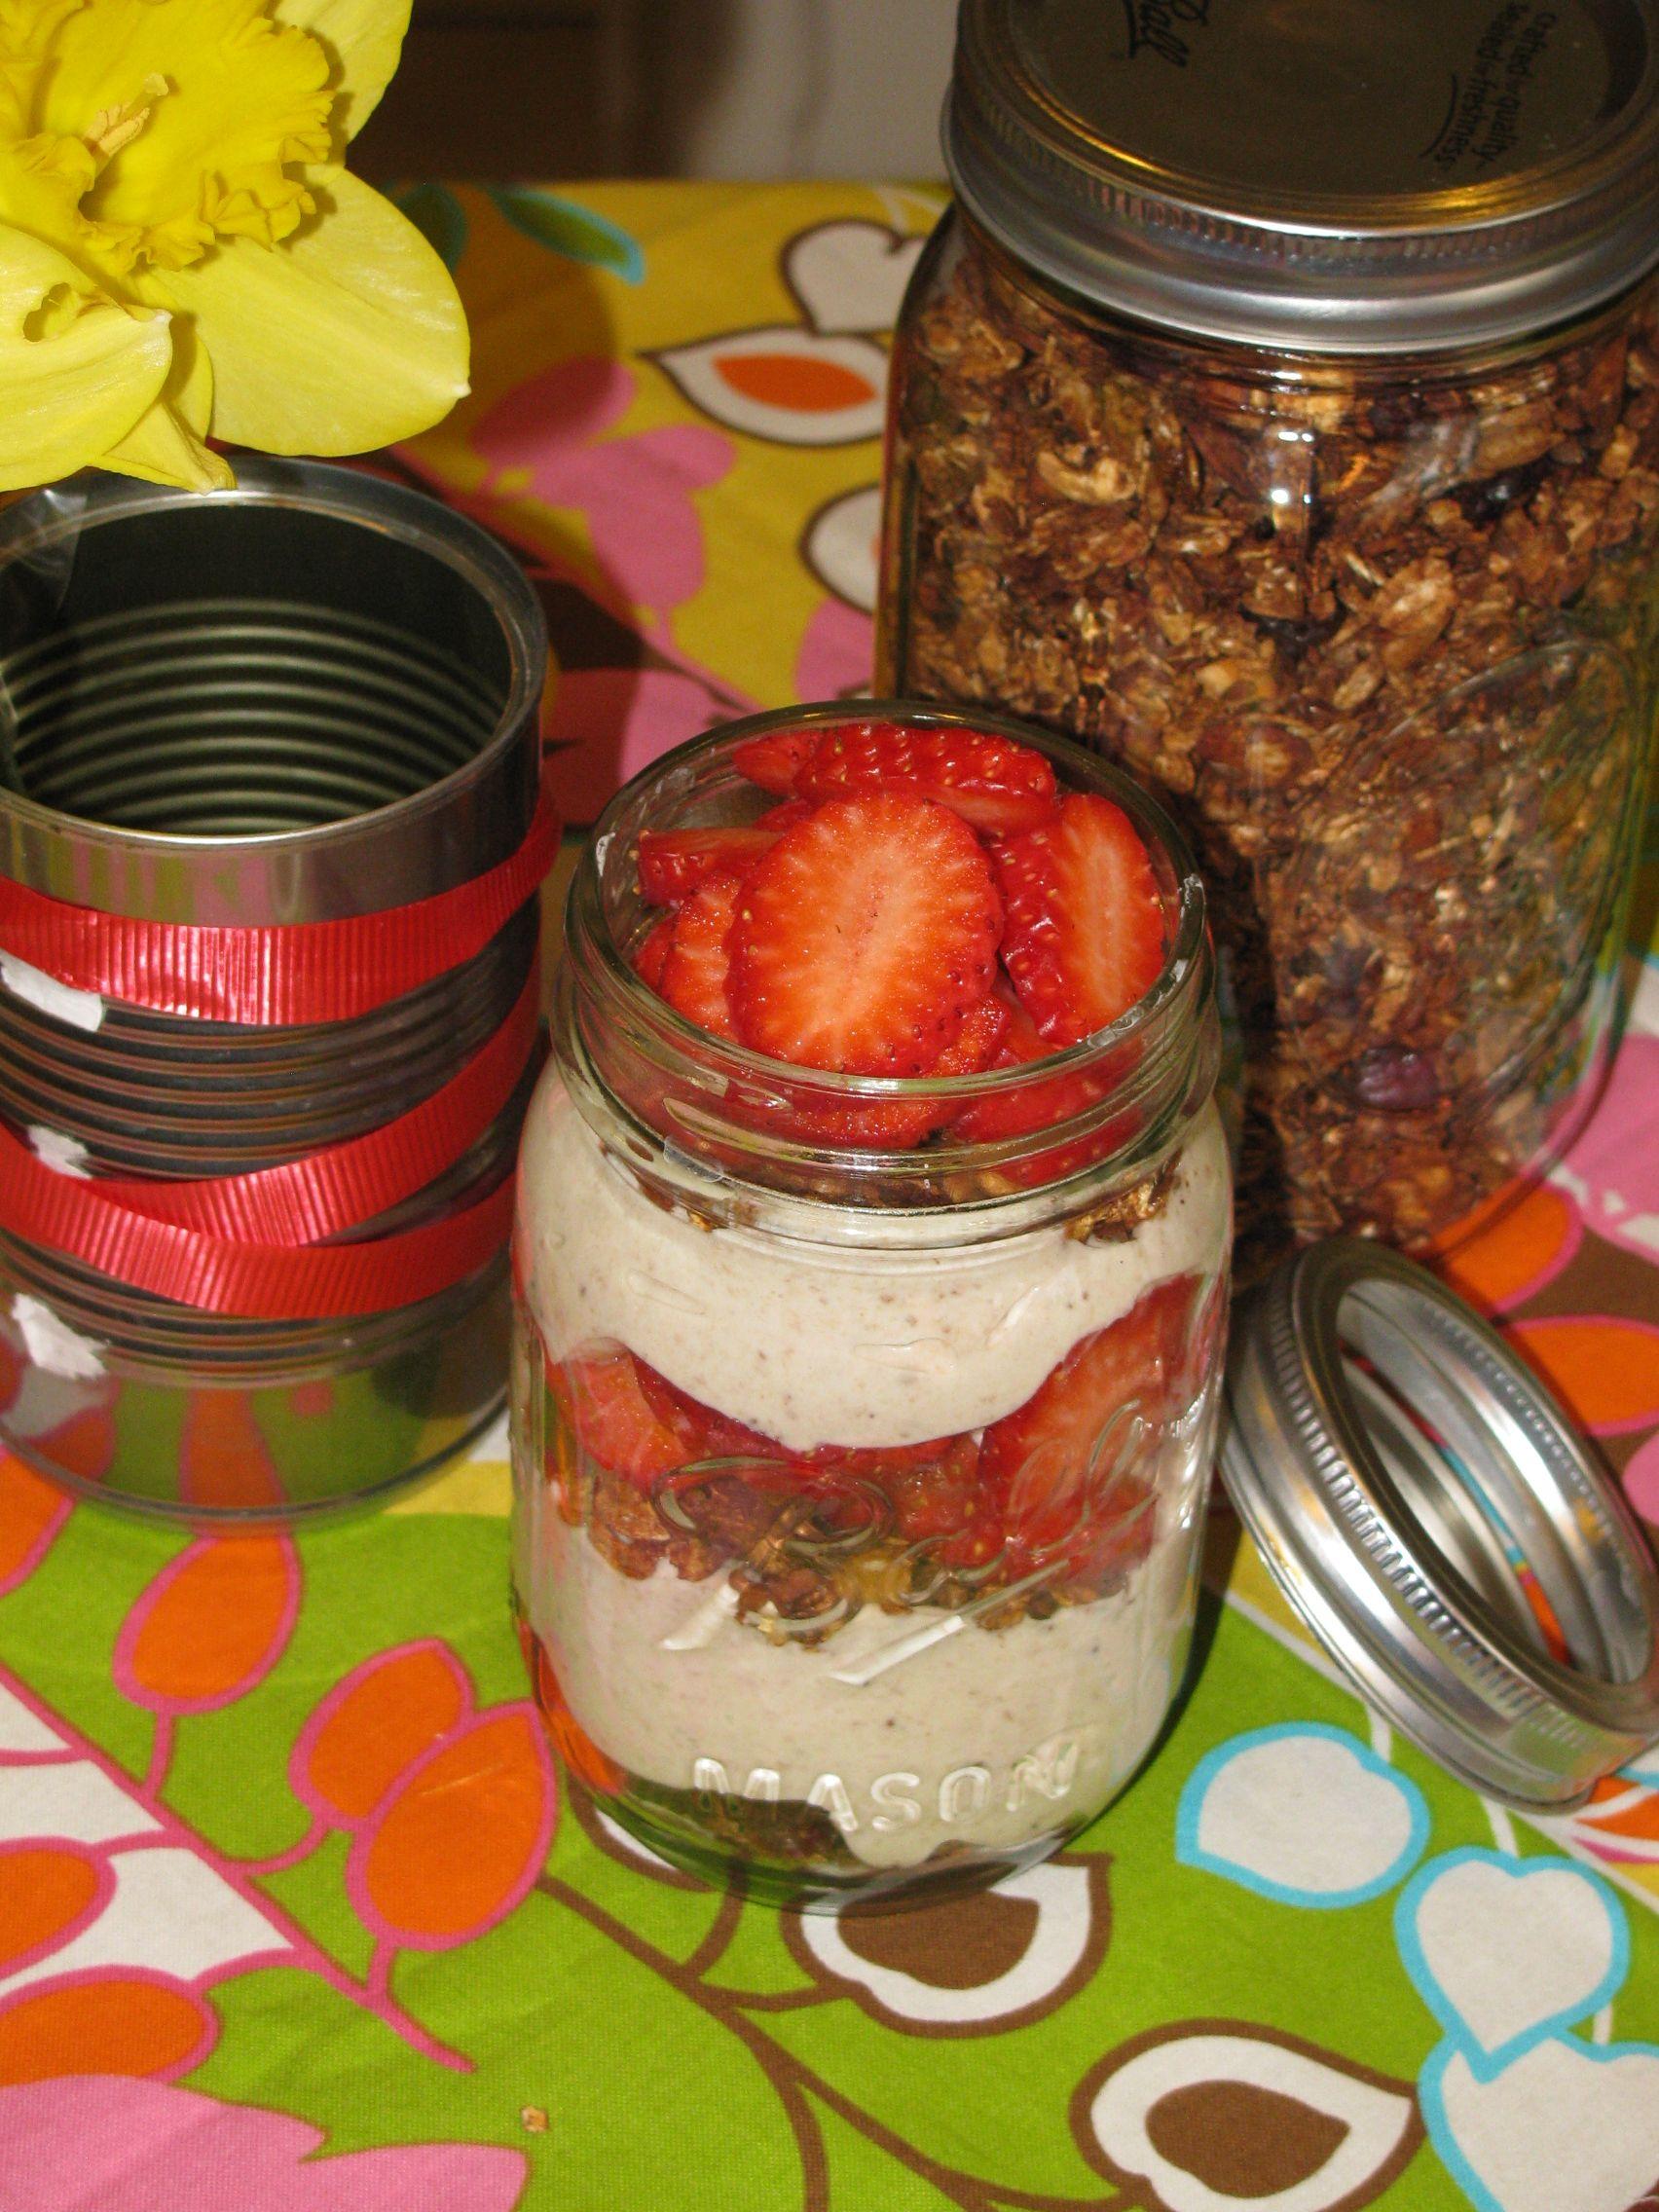 Easy Strawberry Yogurt with Chocolate Granola Topping